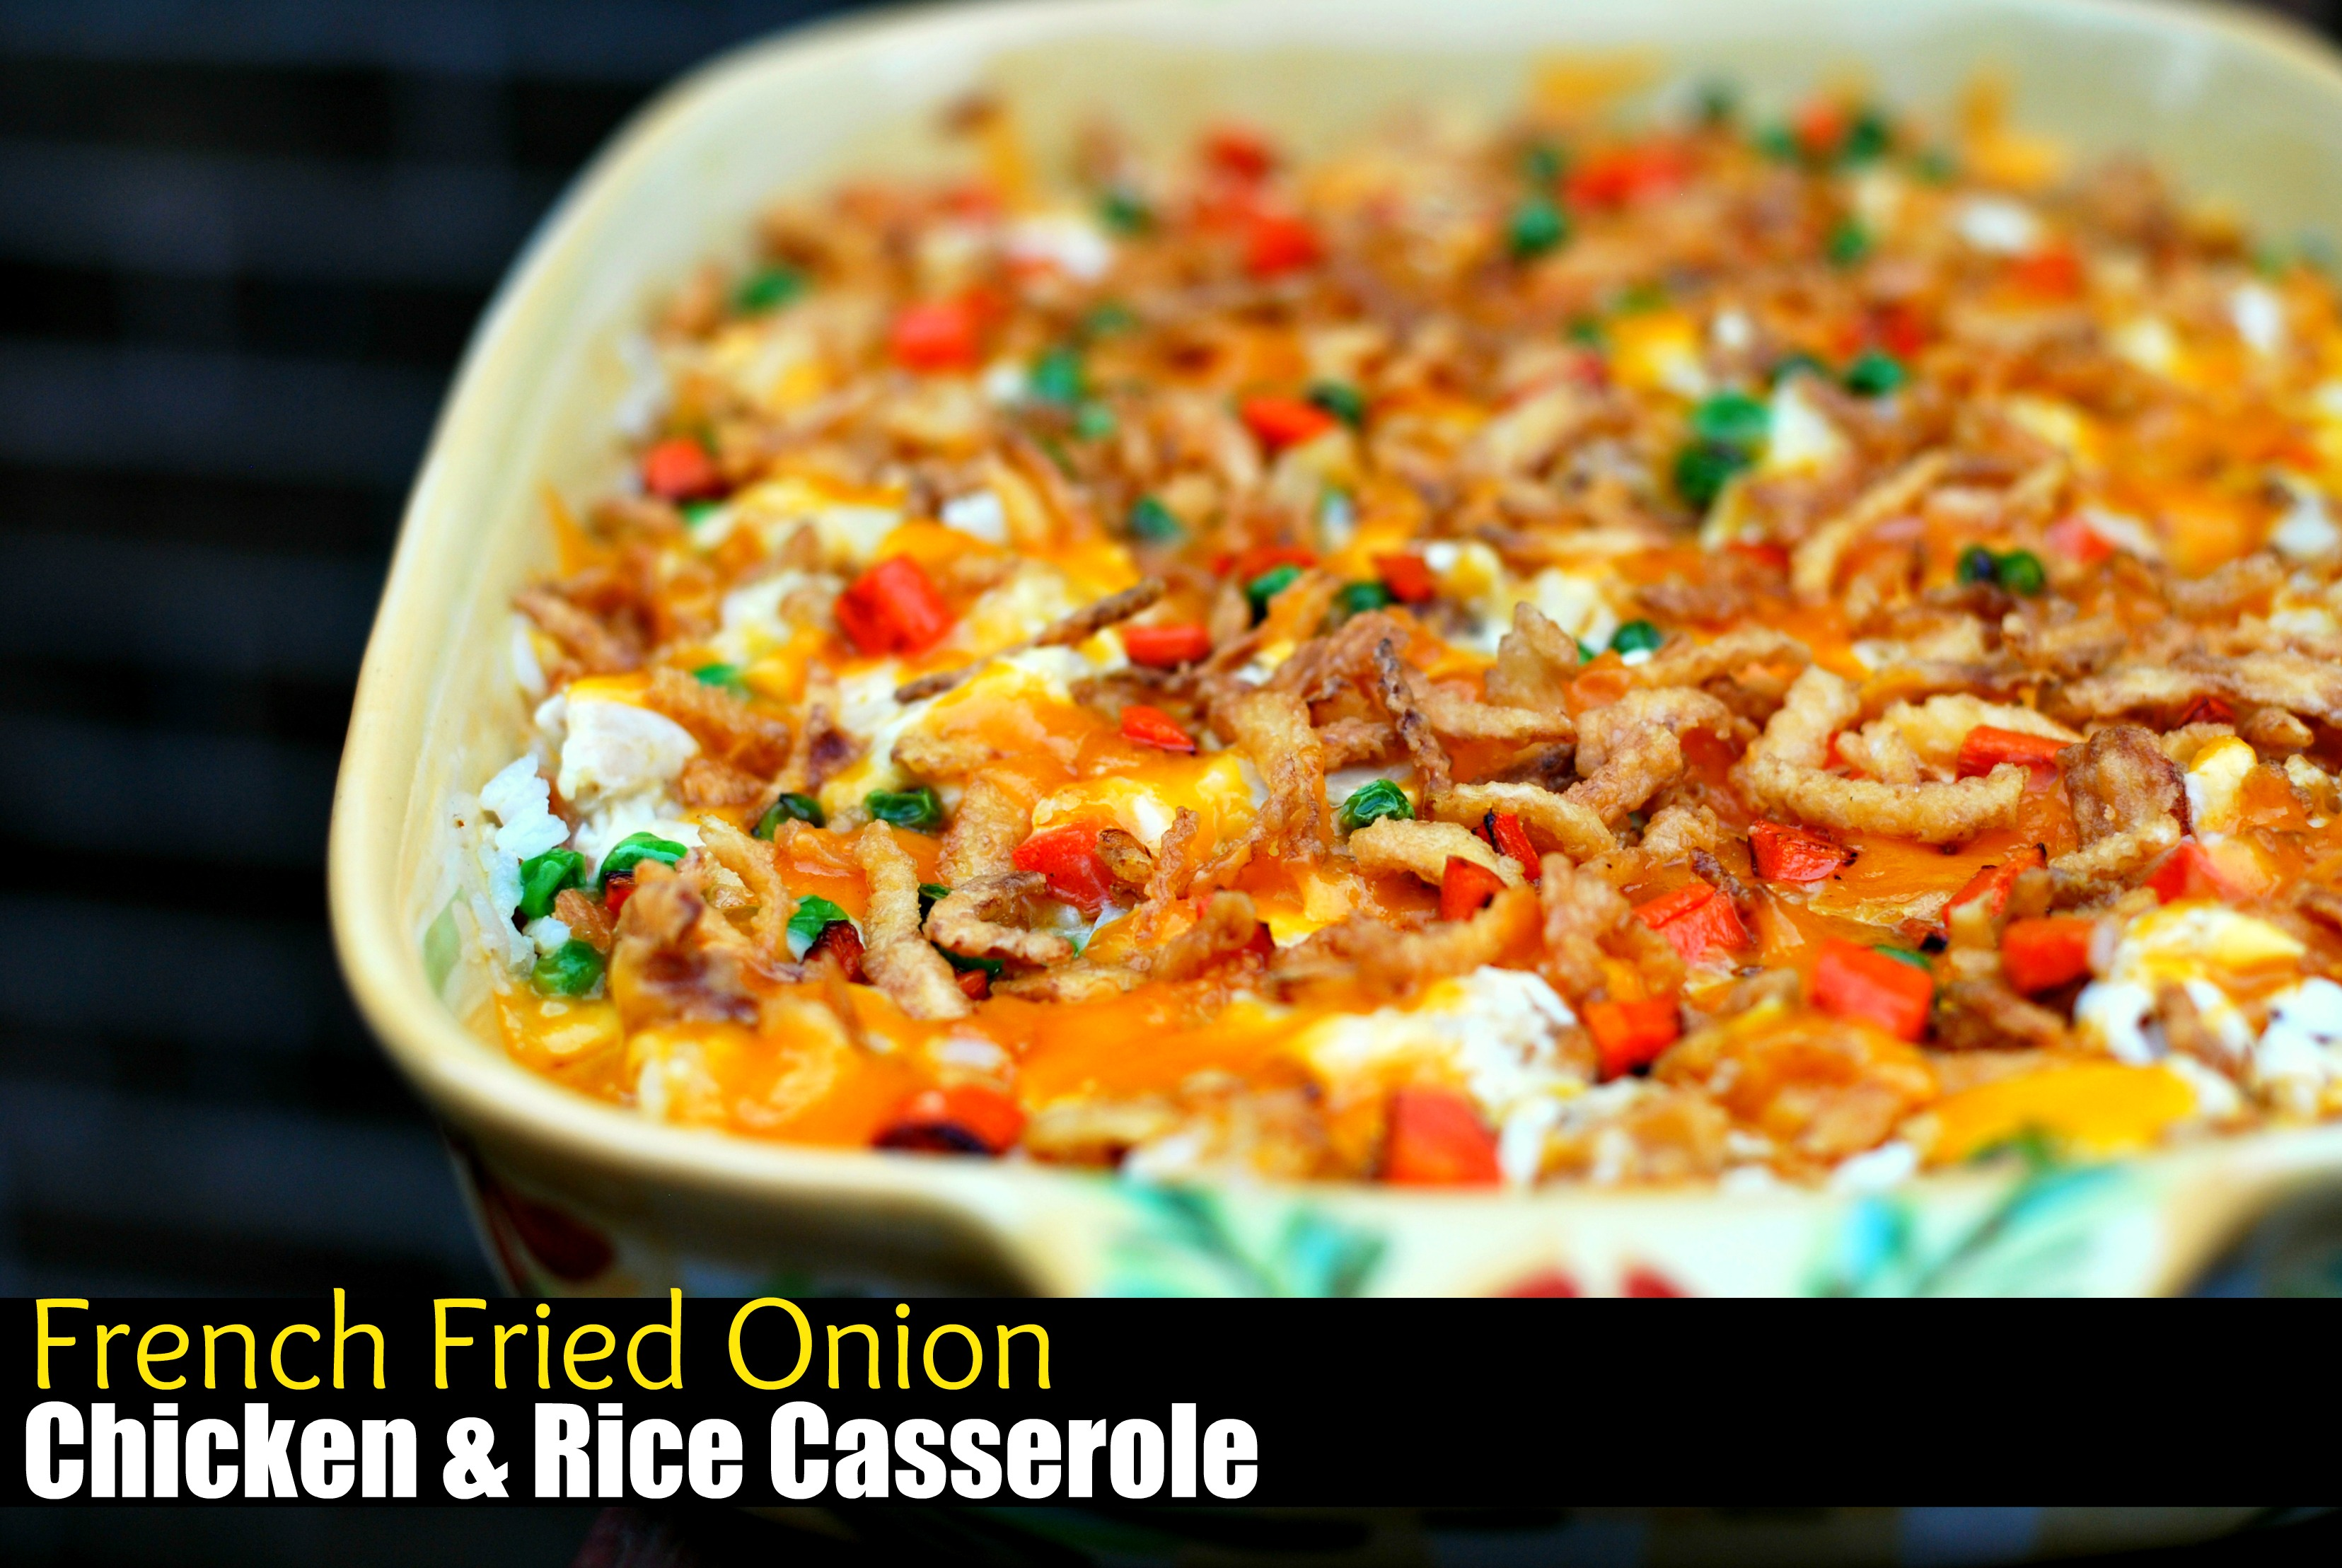 French Fried Onion Chicken & Rice Casserole